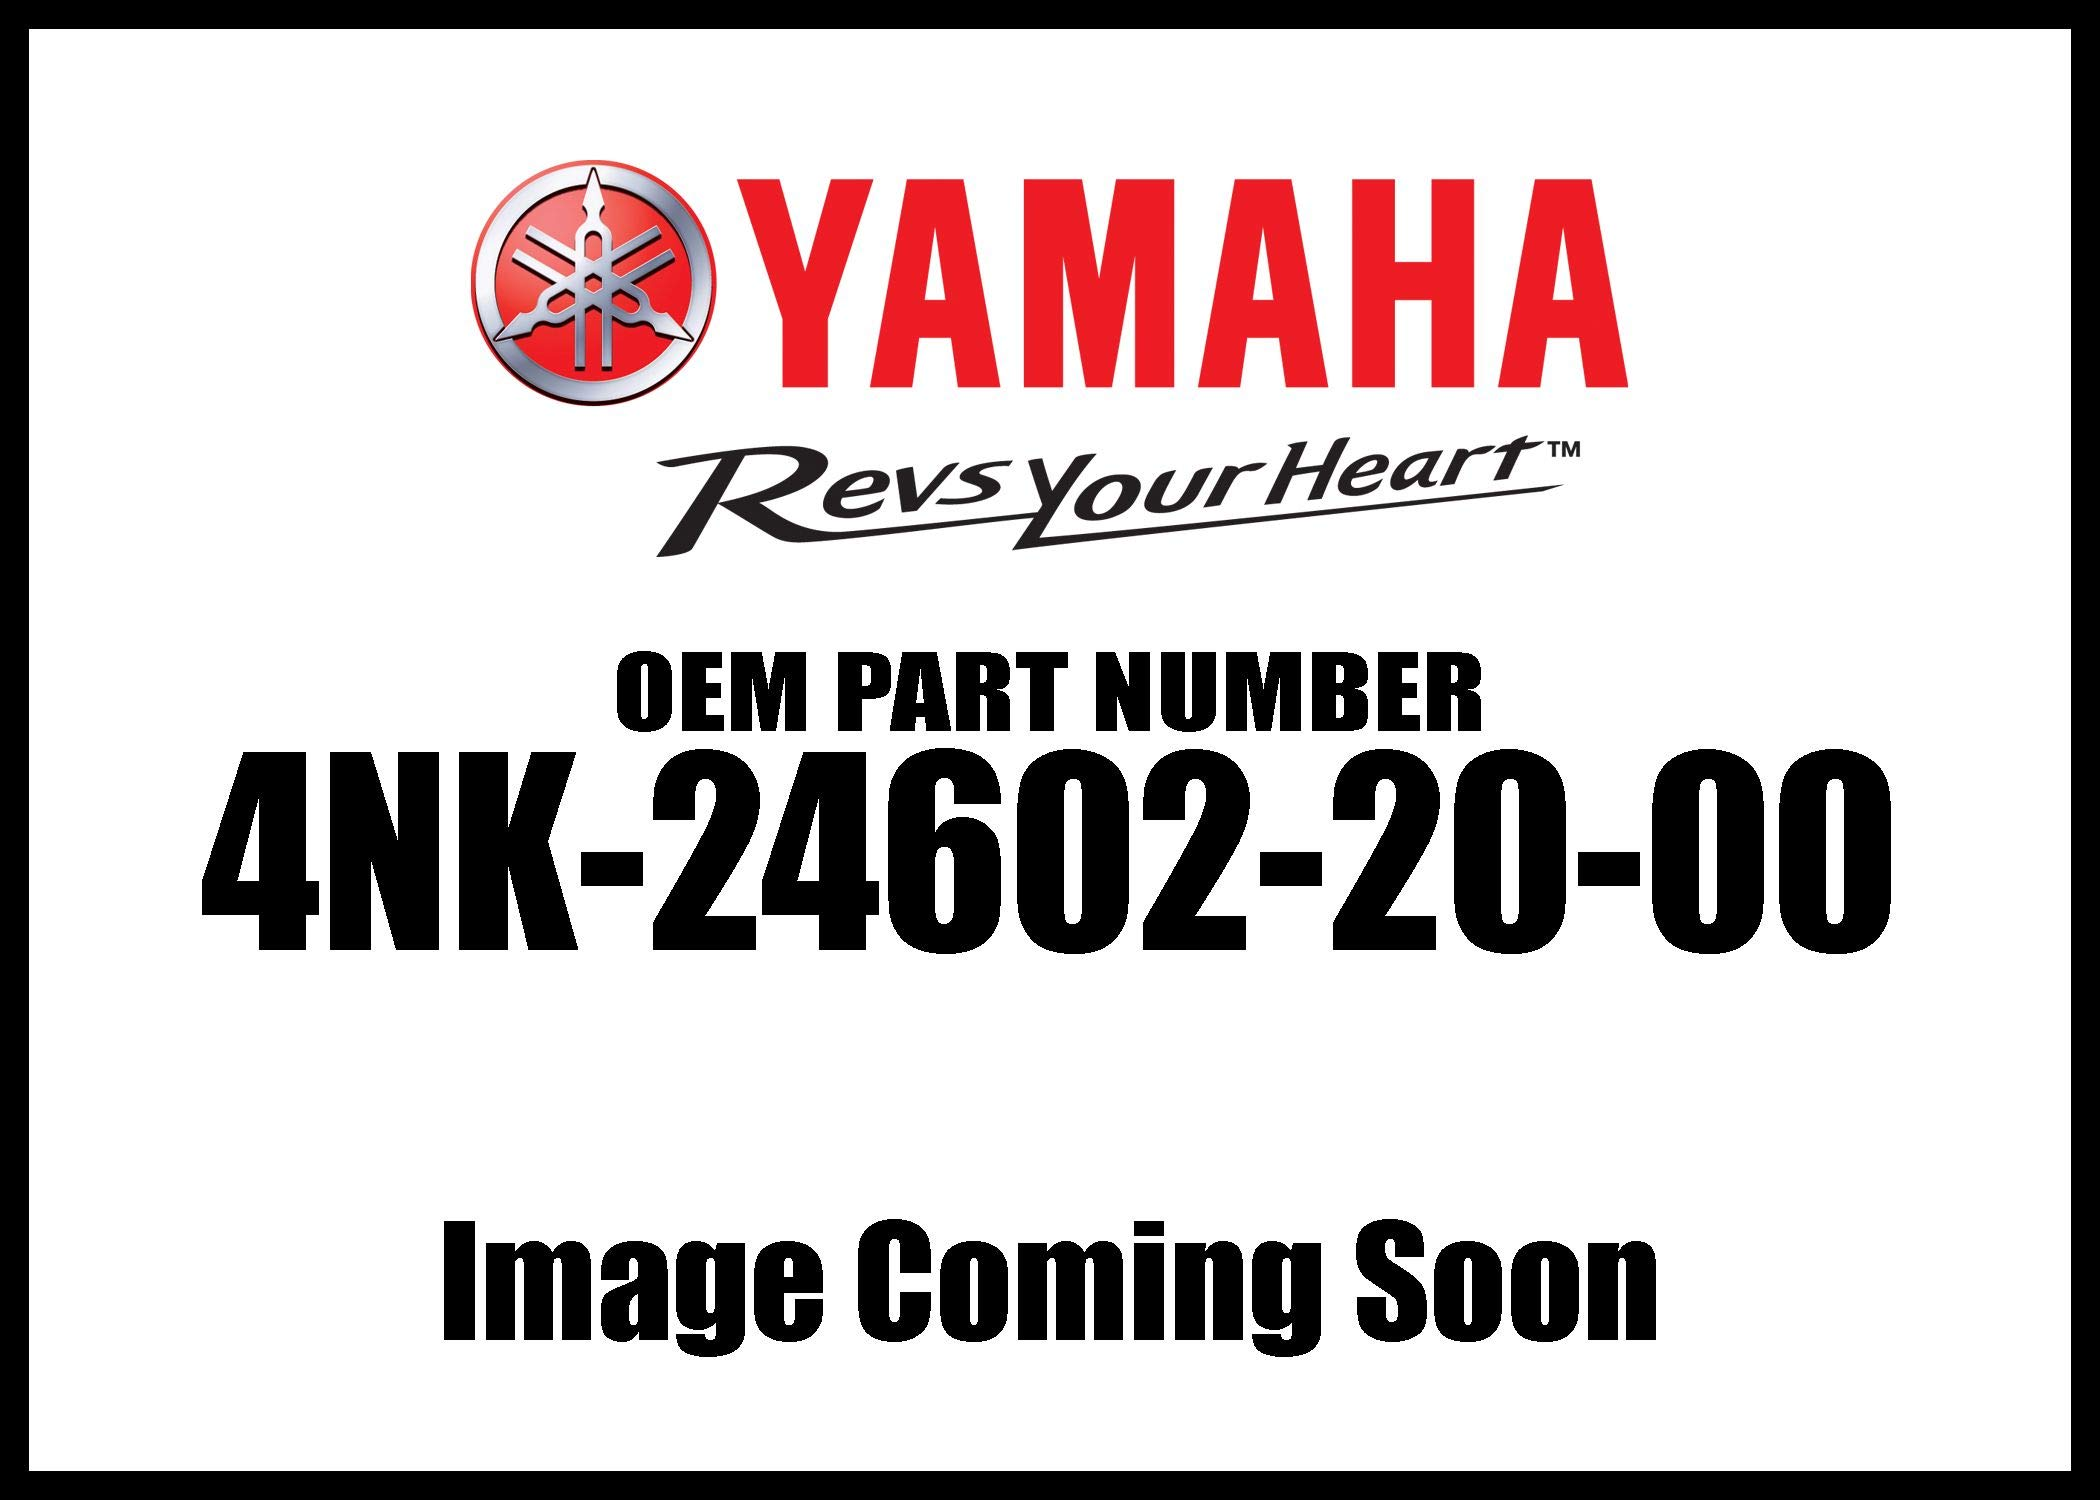 Yamaha 4NK-24602-20-00 Cap Assembly; 4NK246022000 Made by Yamaha